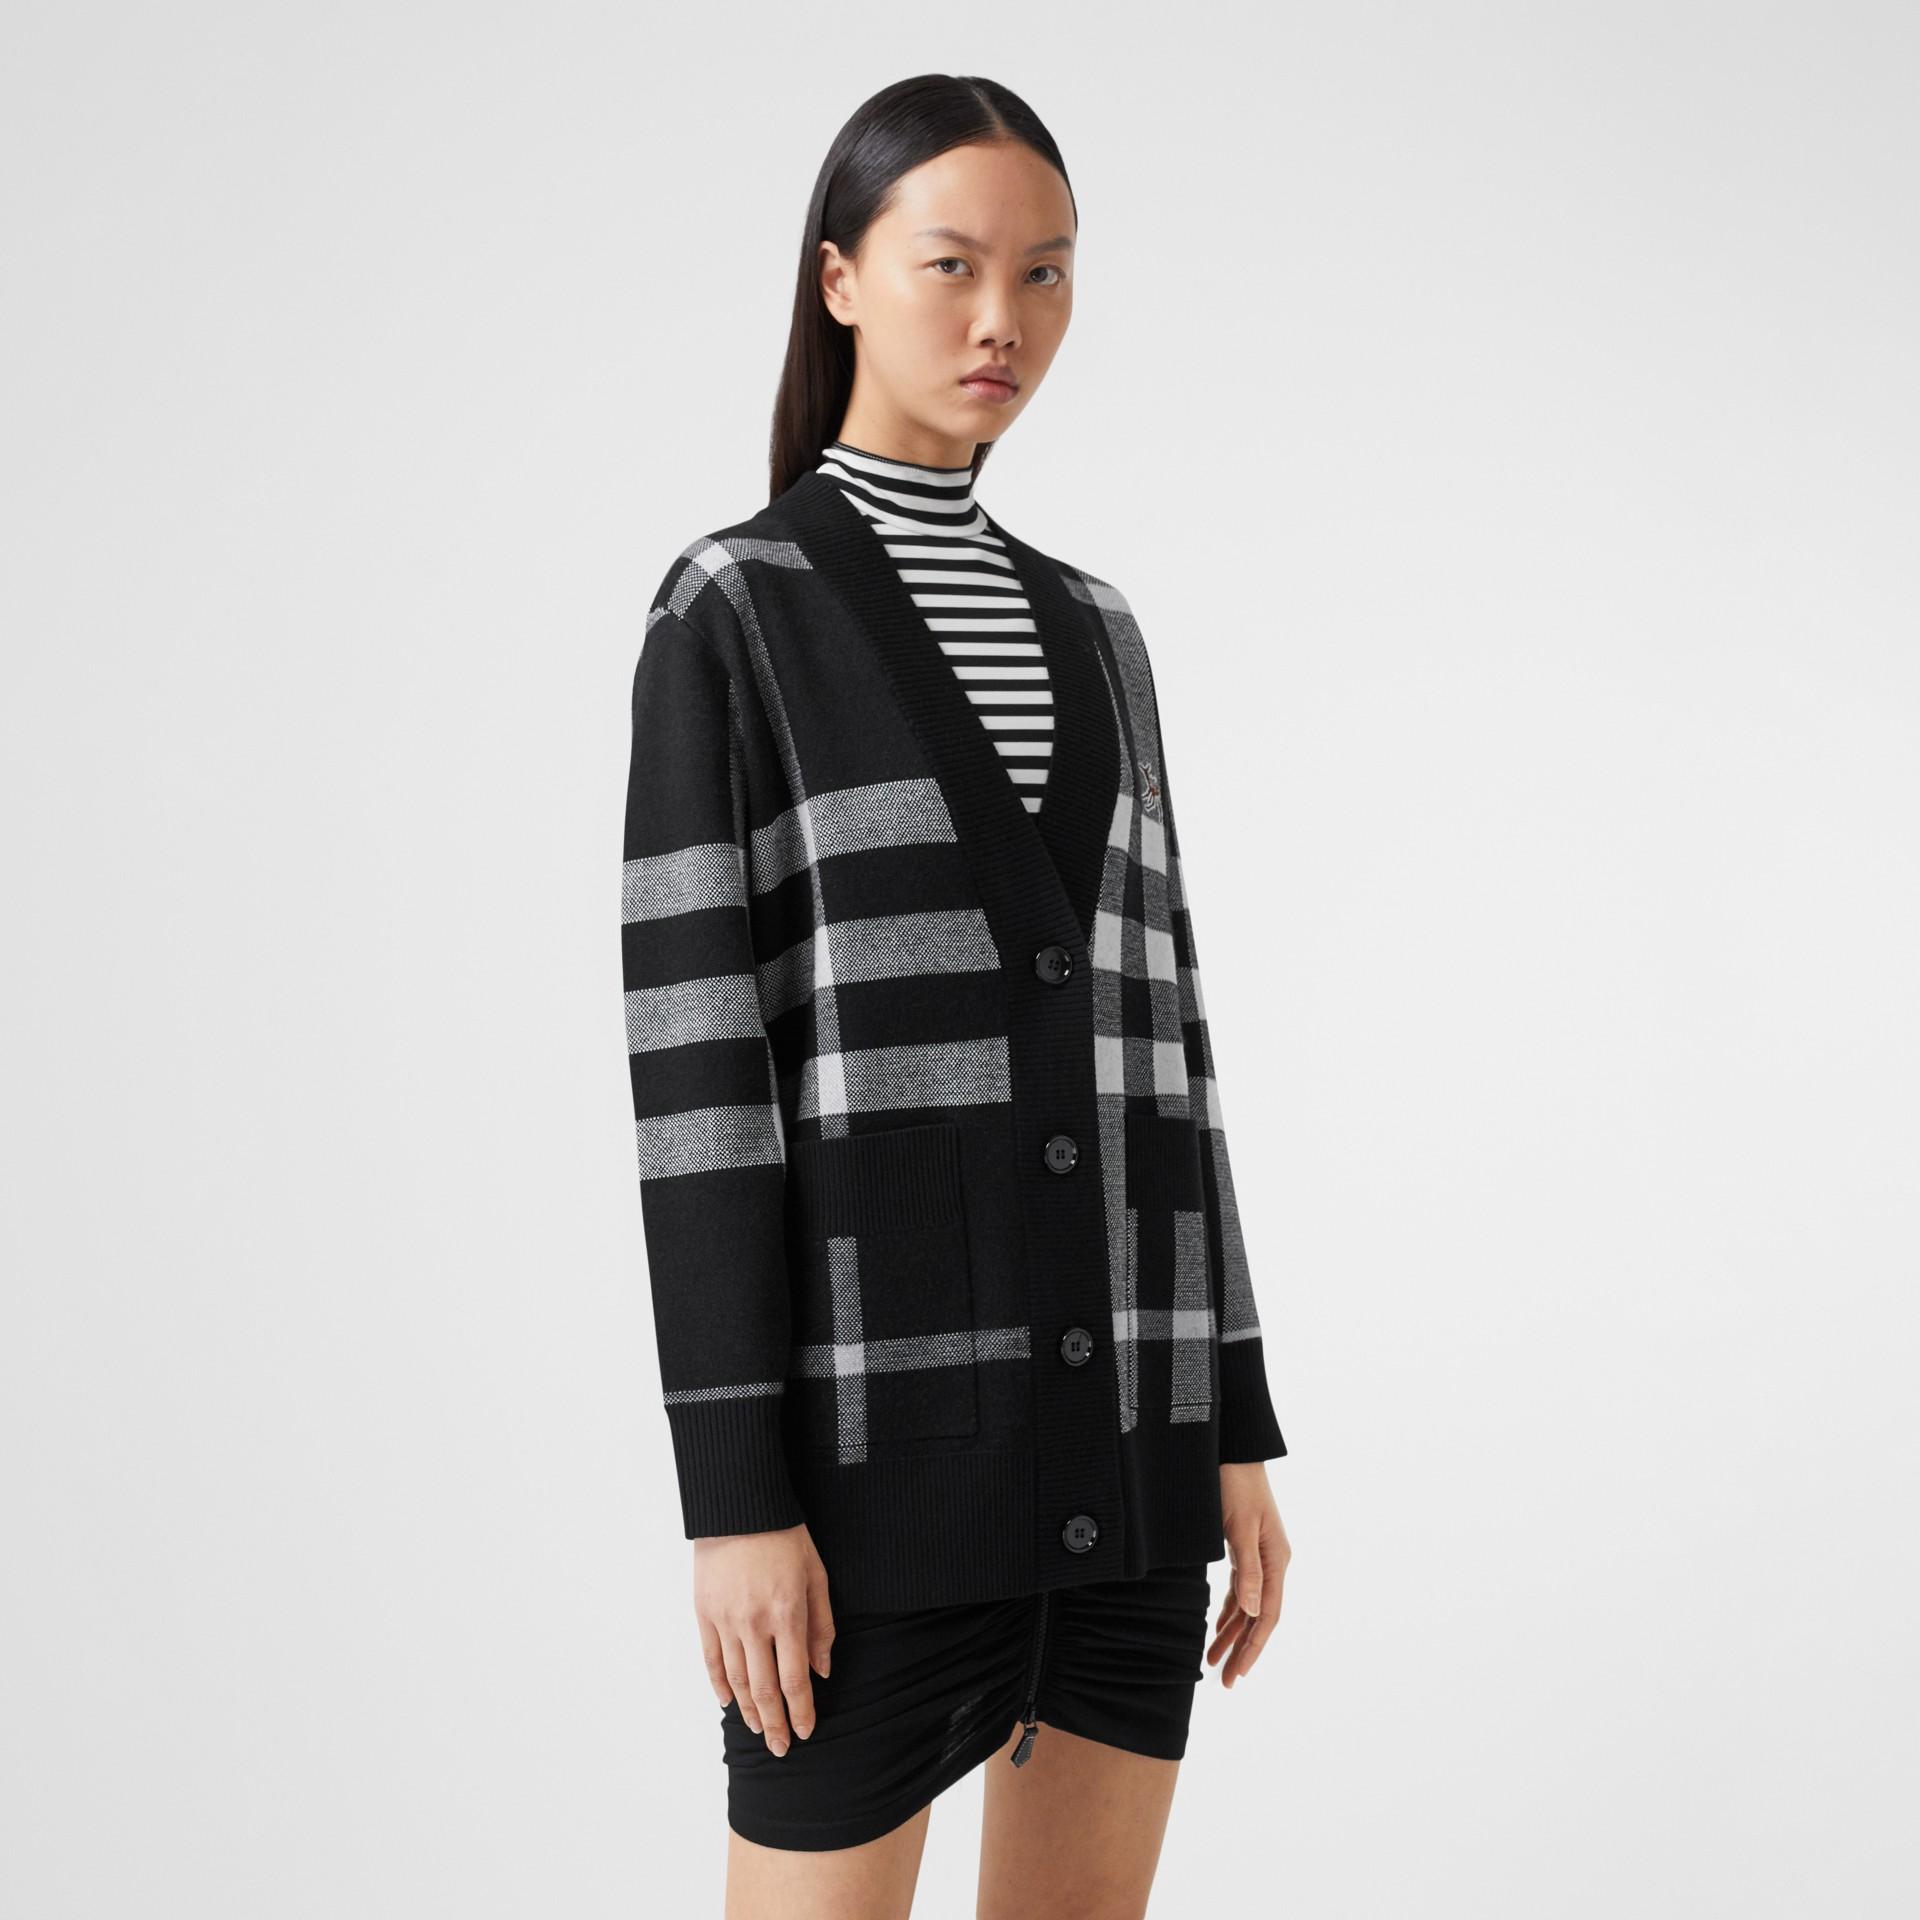 Deer Motif Check Wool Blend Jacquard Cardigan in Black - Women | Burberry - gallery image 4